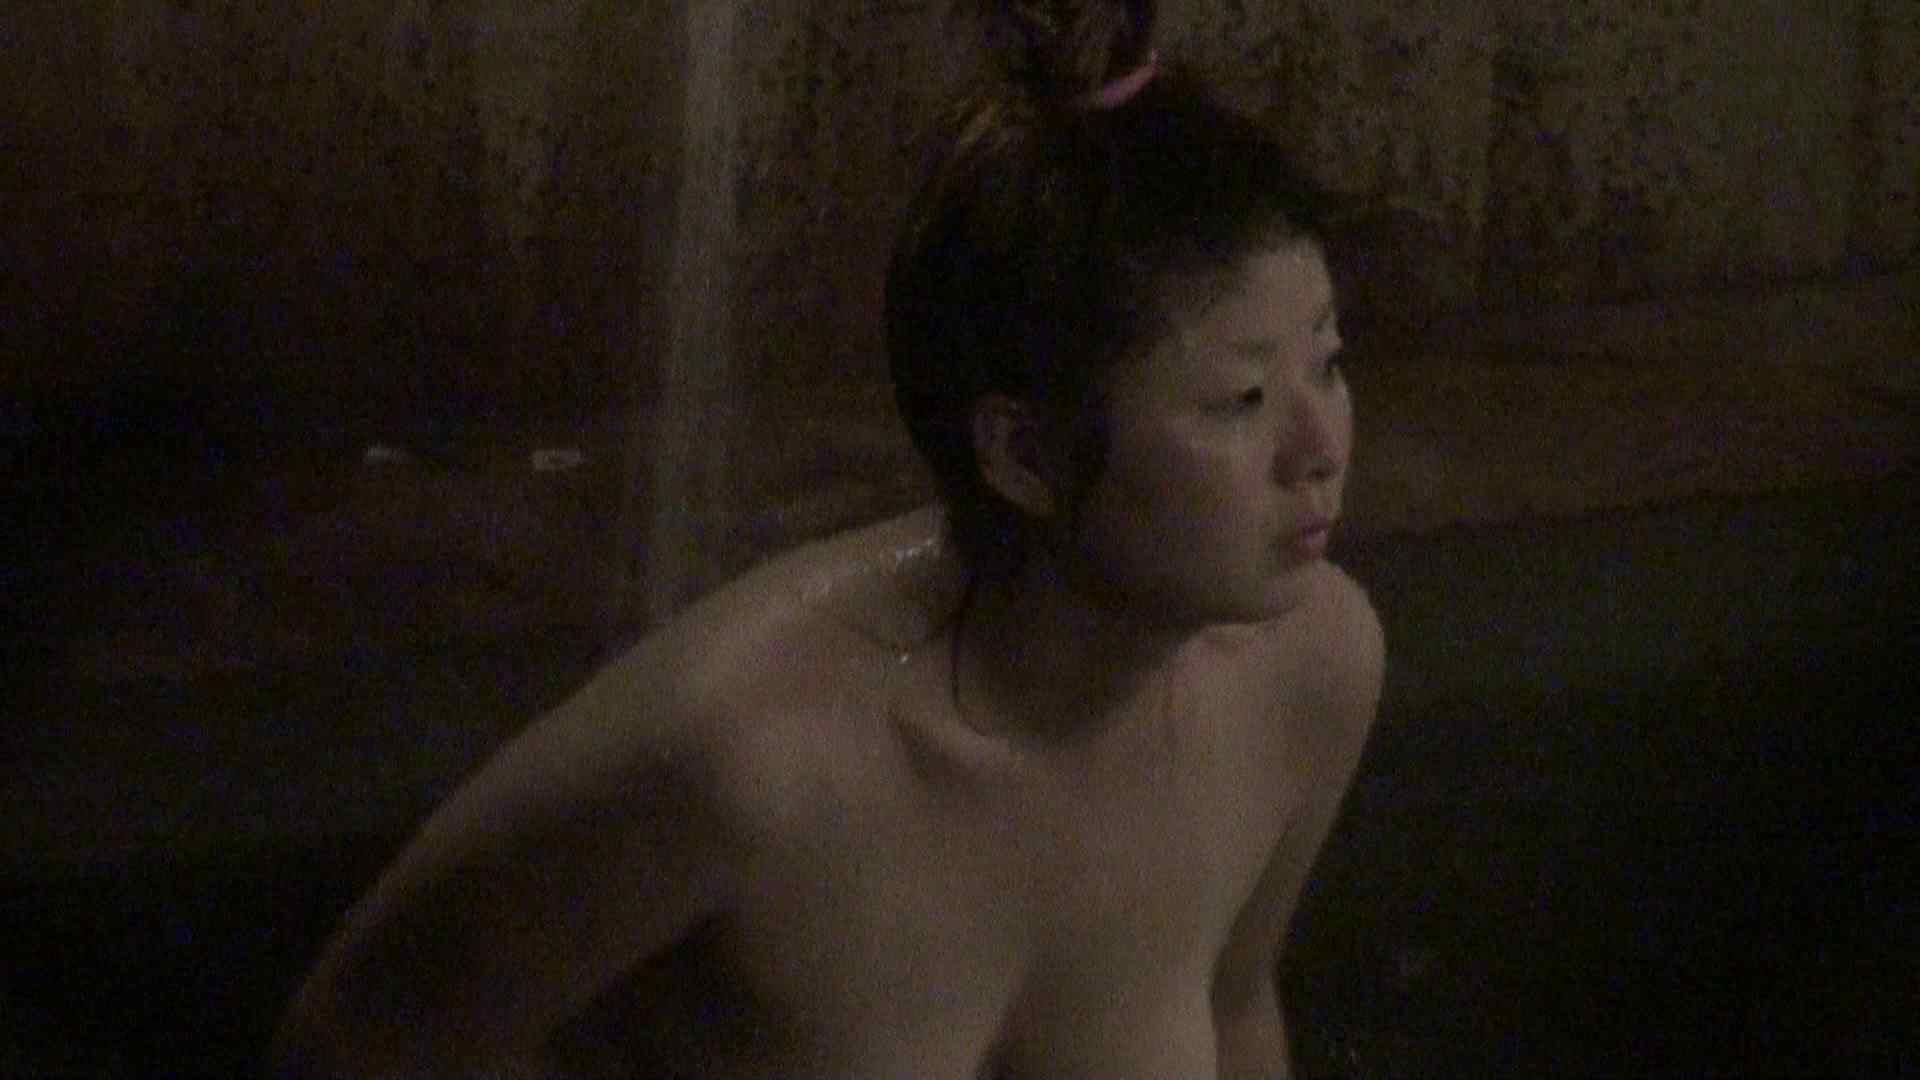 Aquaな露天風呂Vol.377 野外 SEX無修正画像 111PIX 107